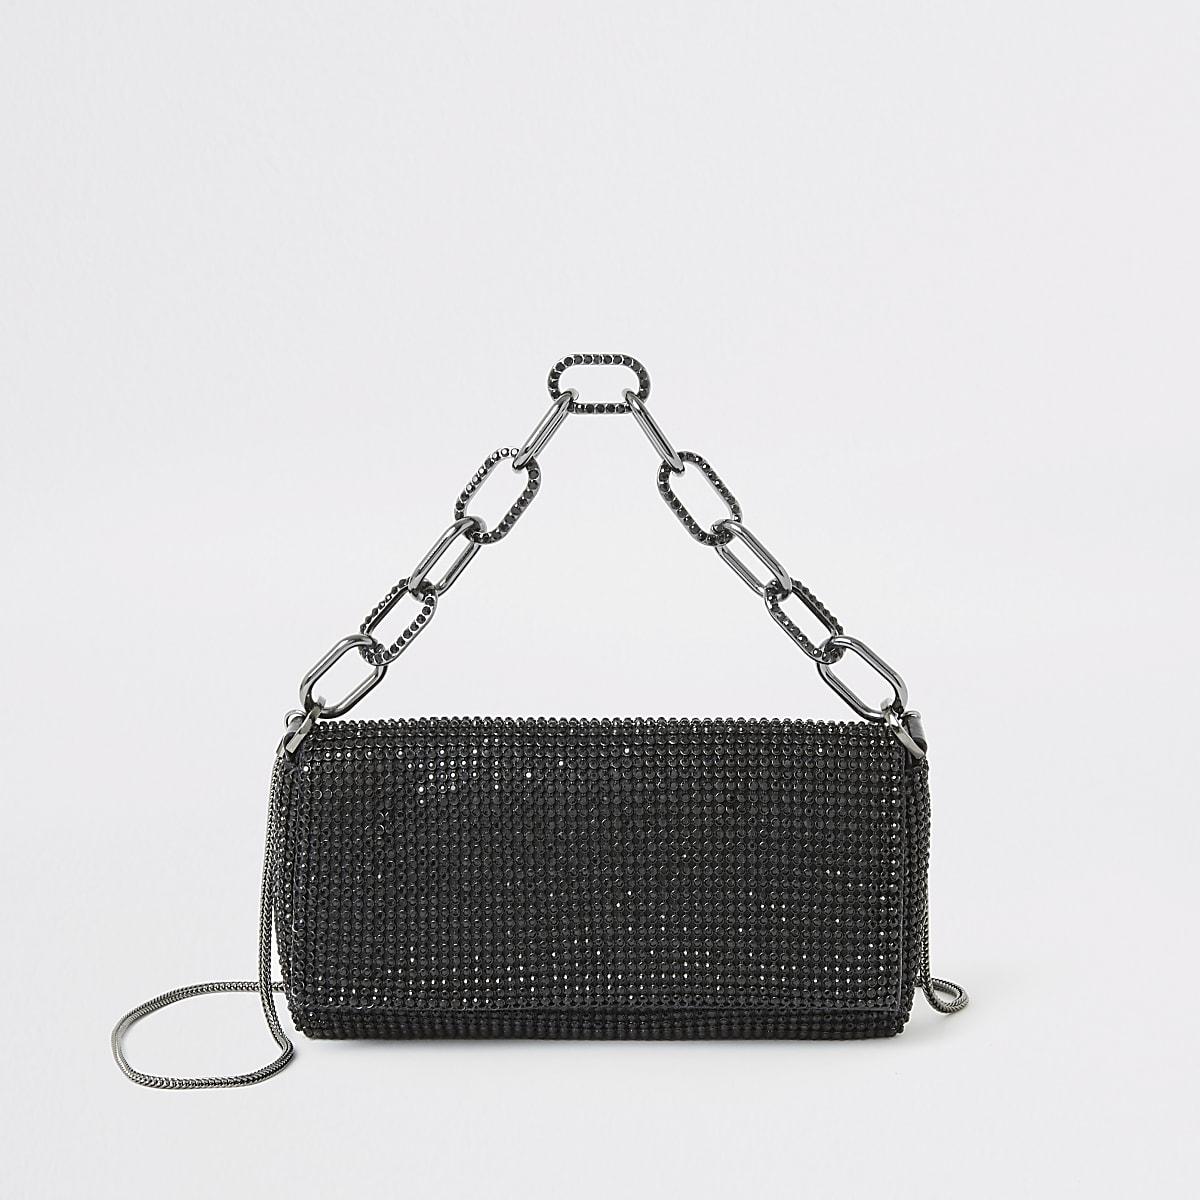 Black diamante embellished underarm bag